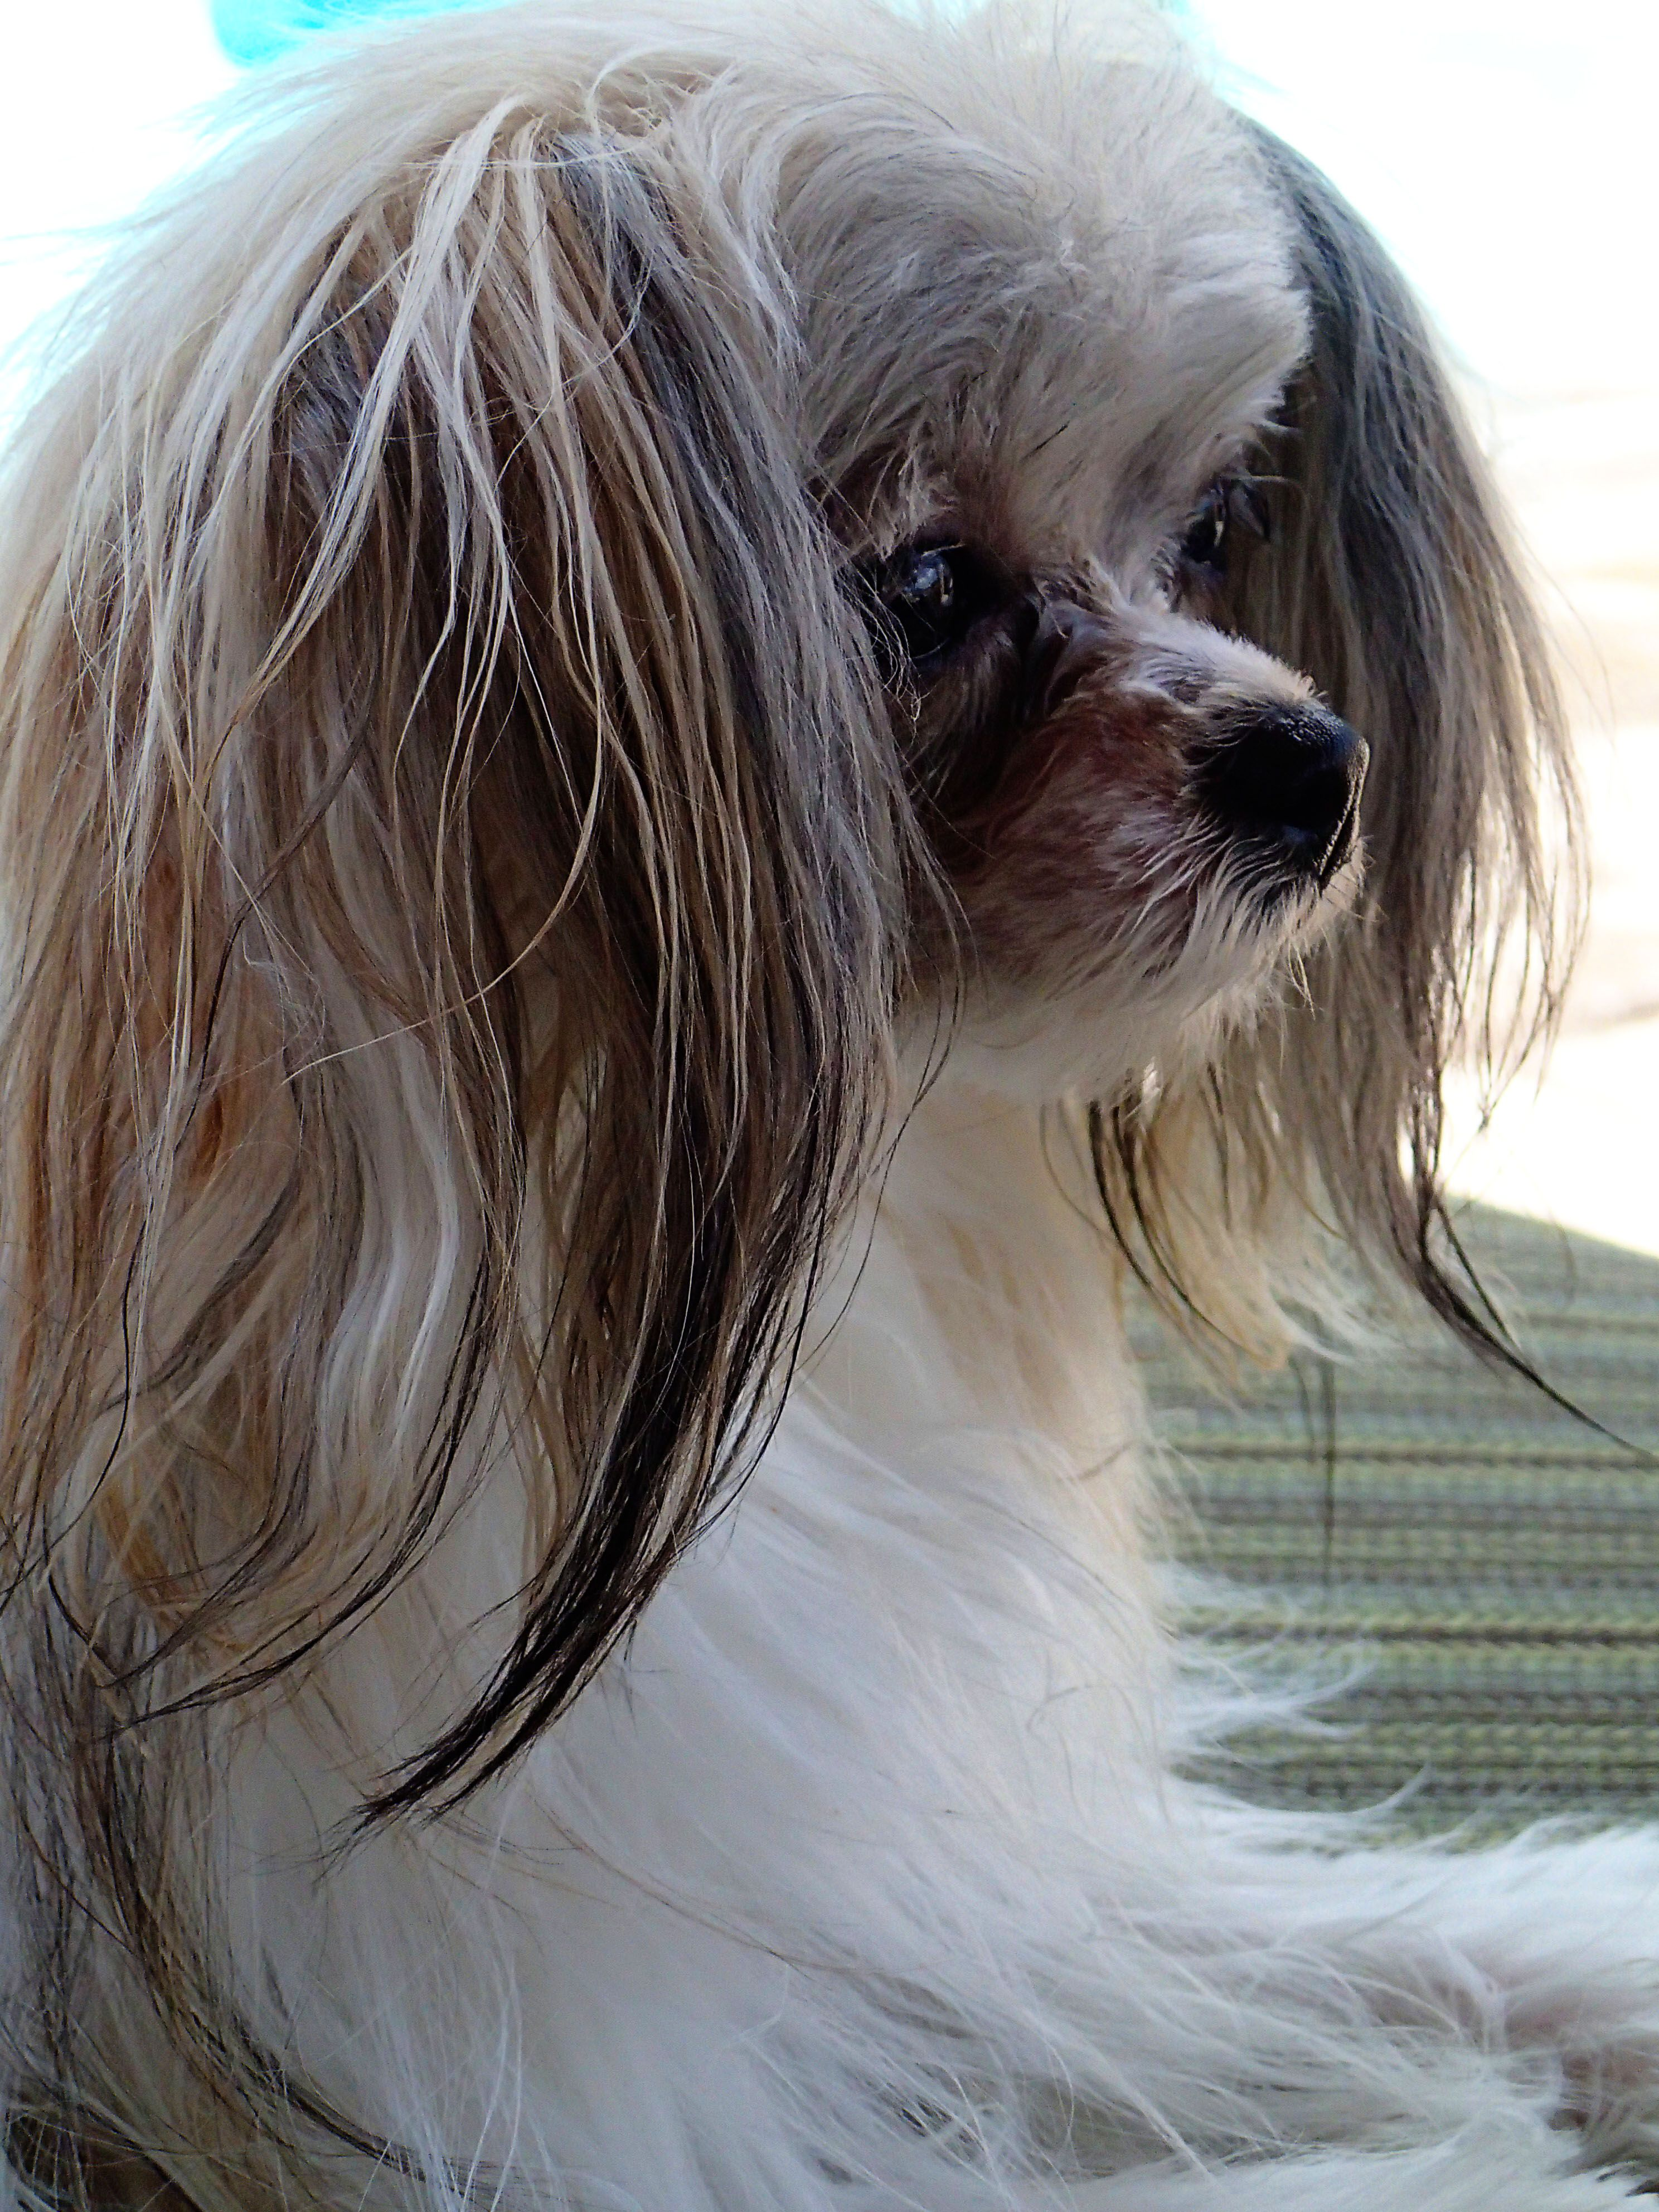 Oh The Life Of A Mi Kik Purebred Dogs Dog List Dog Life